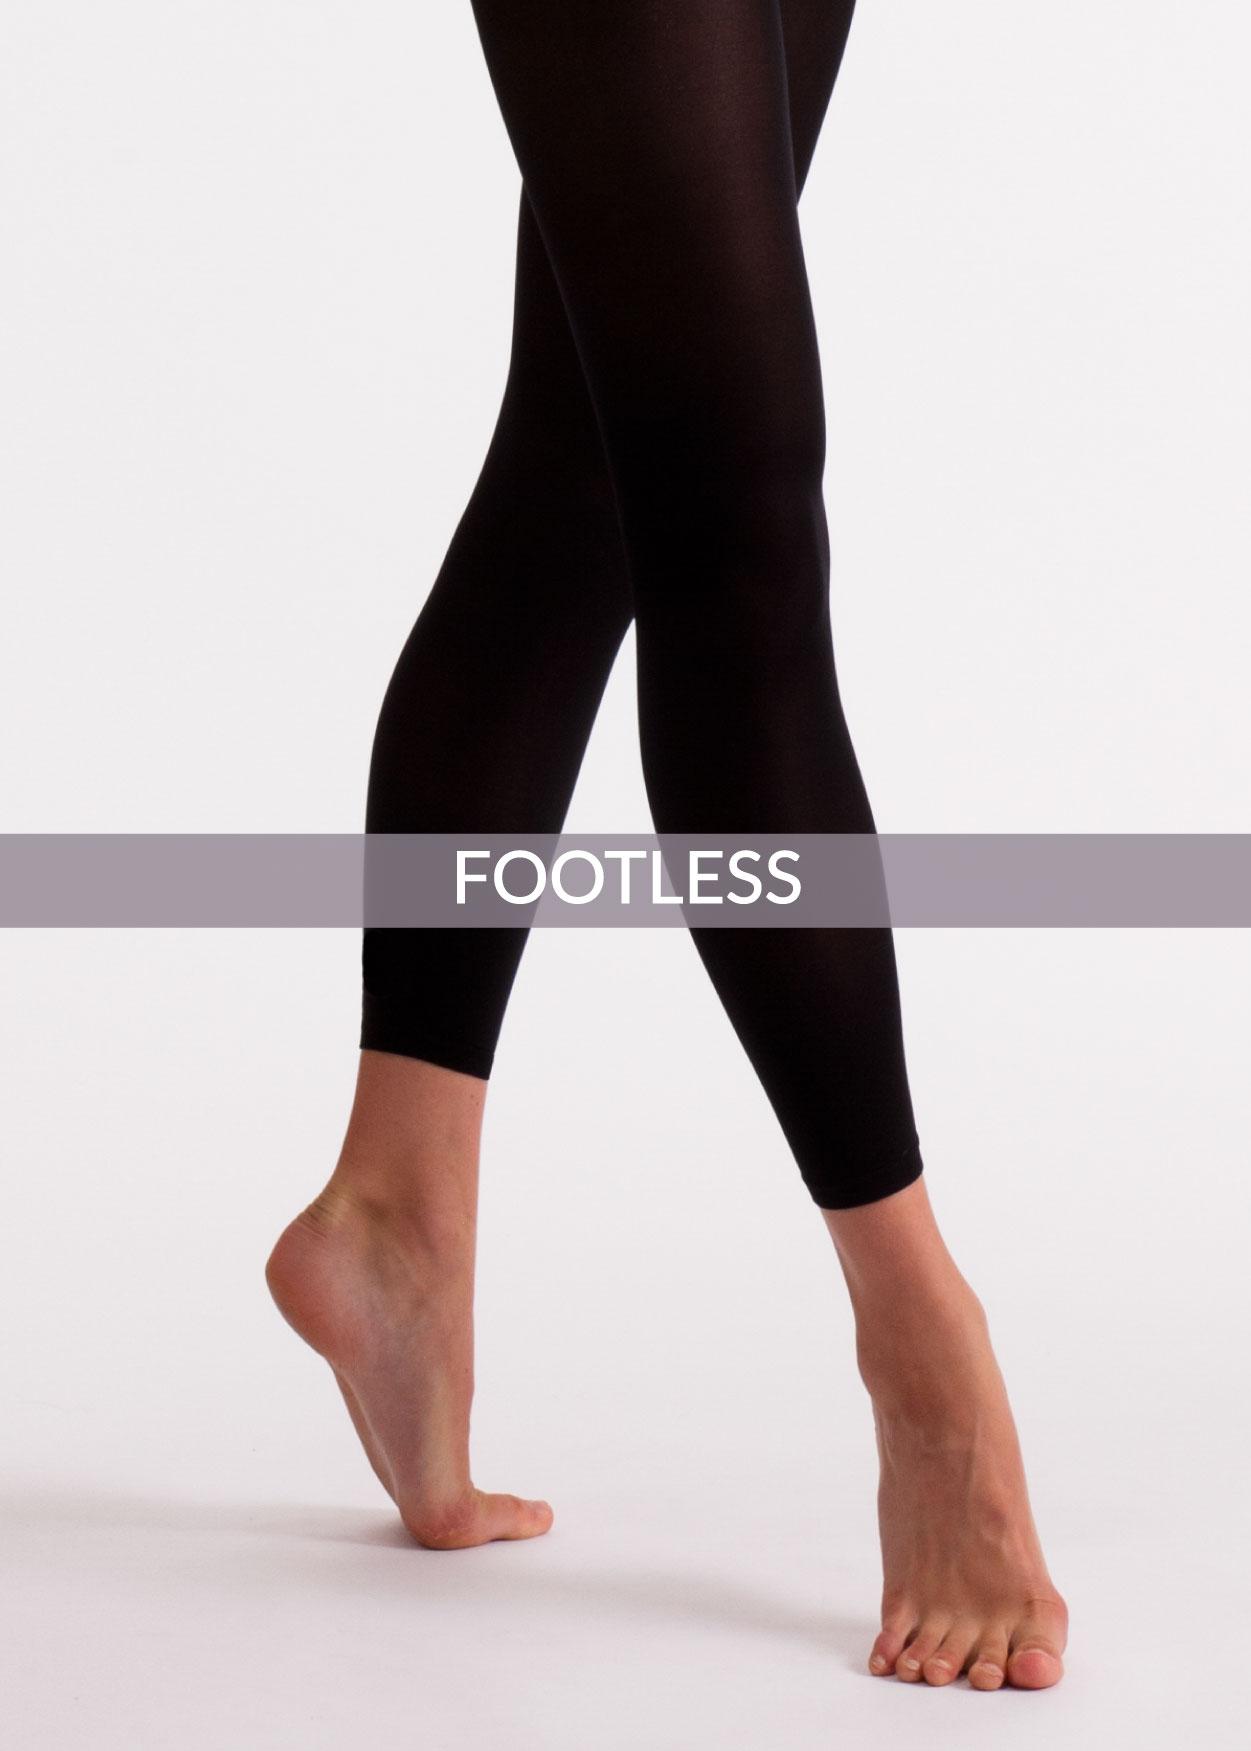 Footless